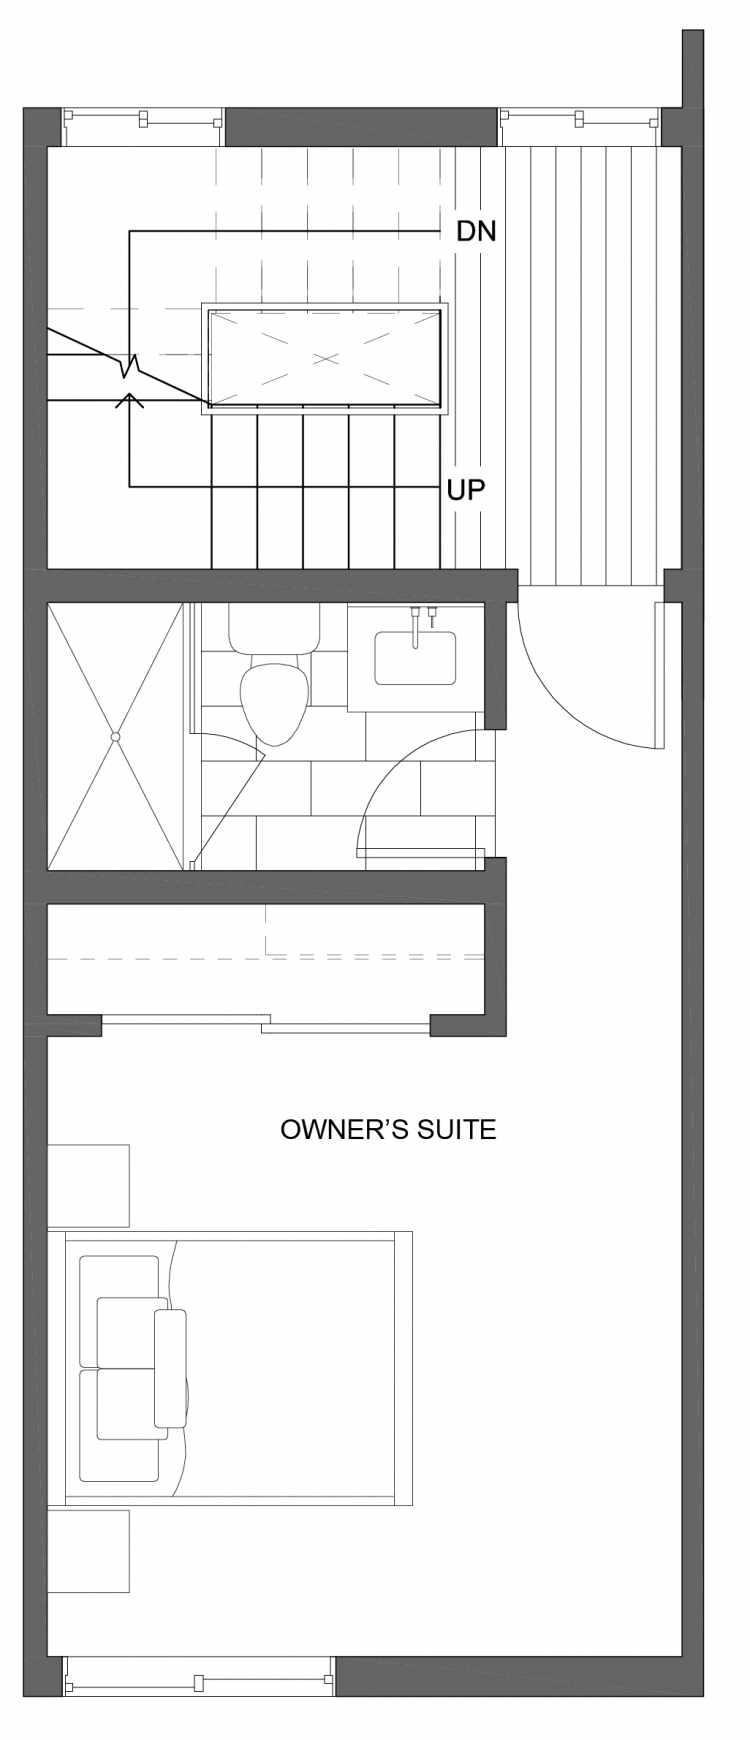 Third Floor Plan of 10429D Alderbrook Pl NW, One of the Jasmine Townhomes in the Greenwood Neighborhood of Seattle